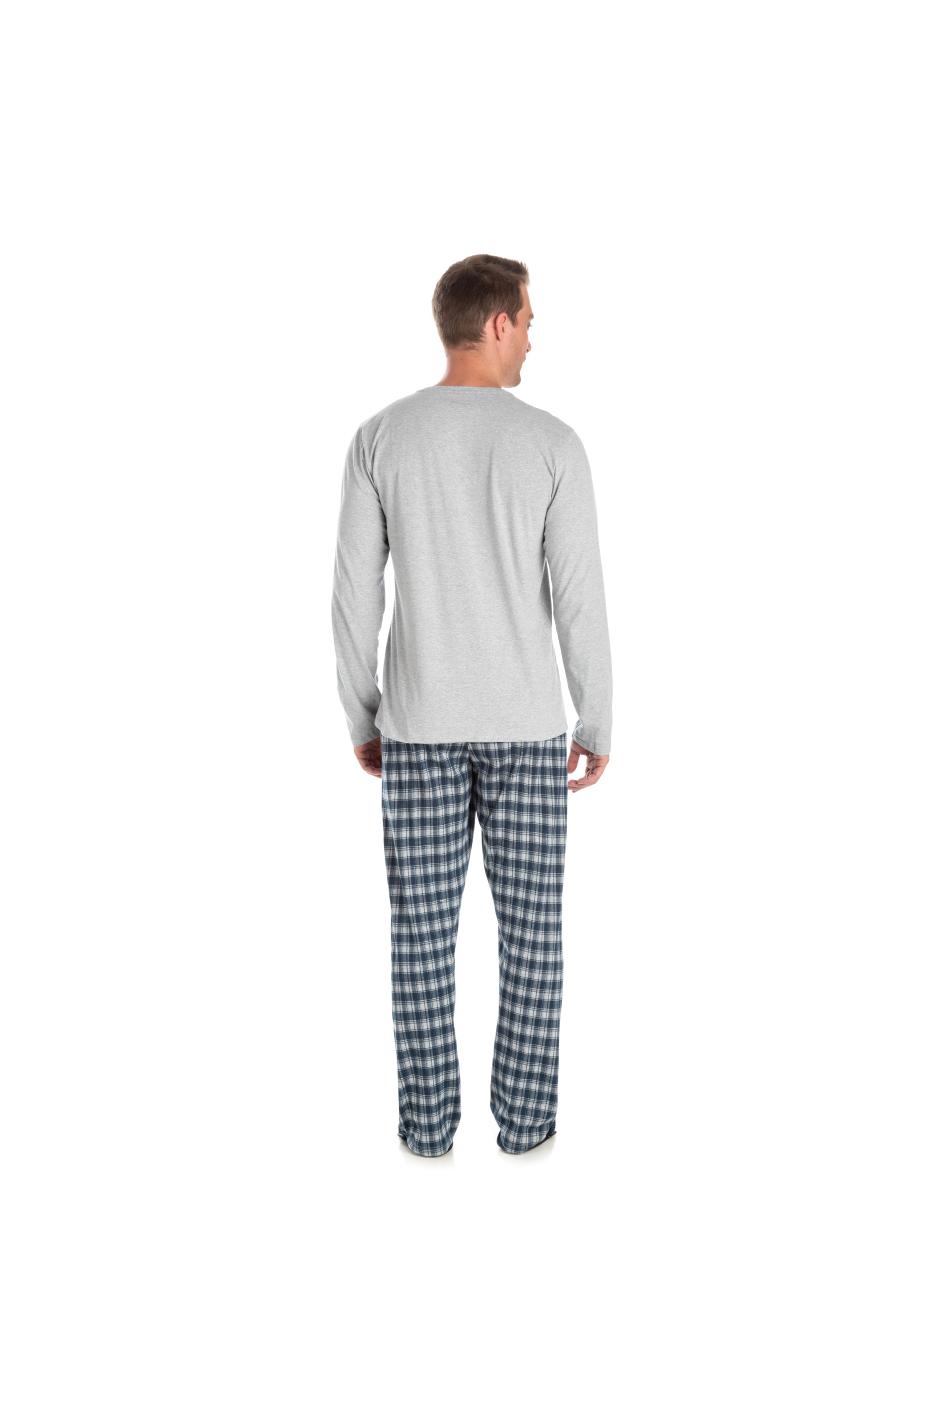 190/D - Pijama Adulto Masculino Xadrez Família Completa